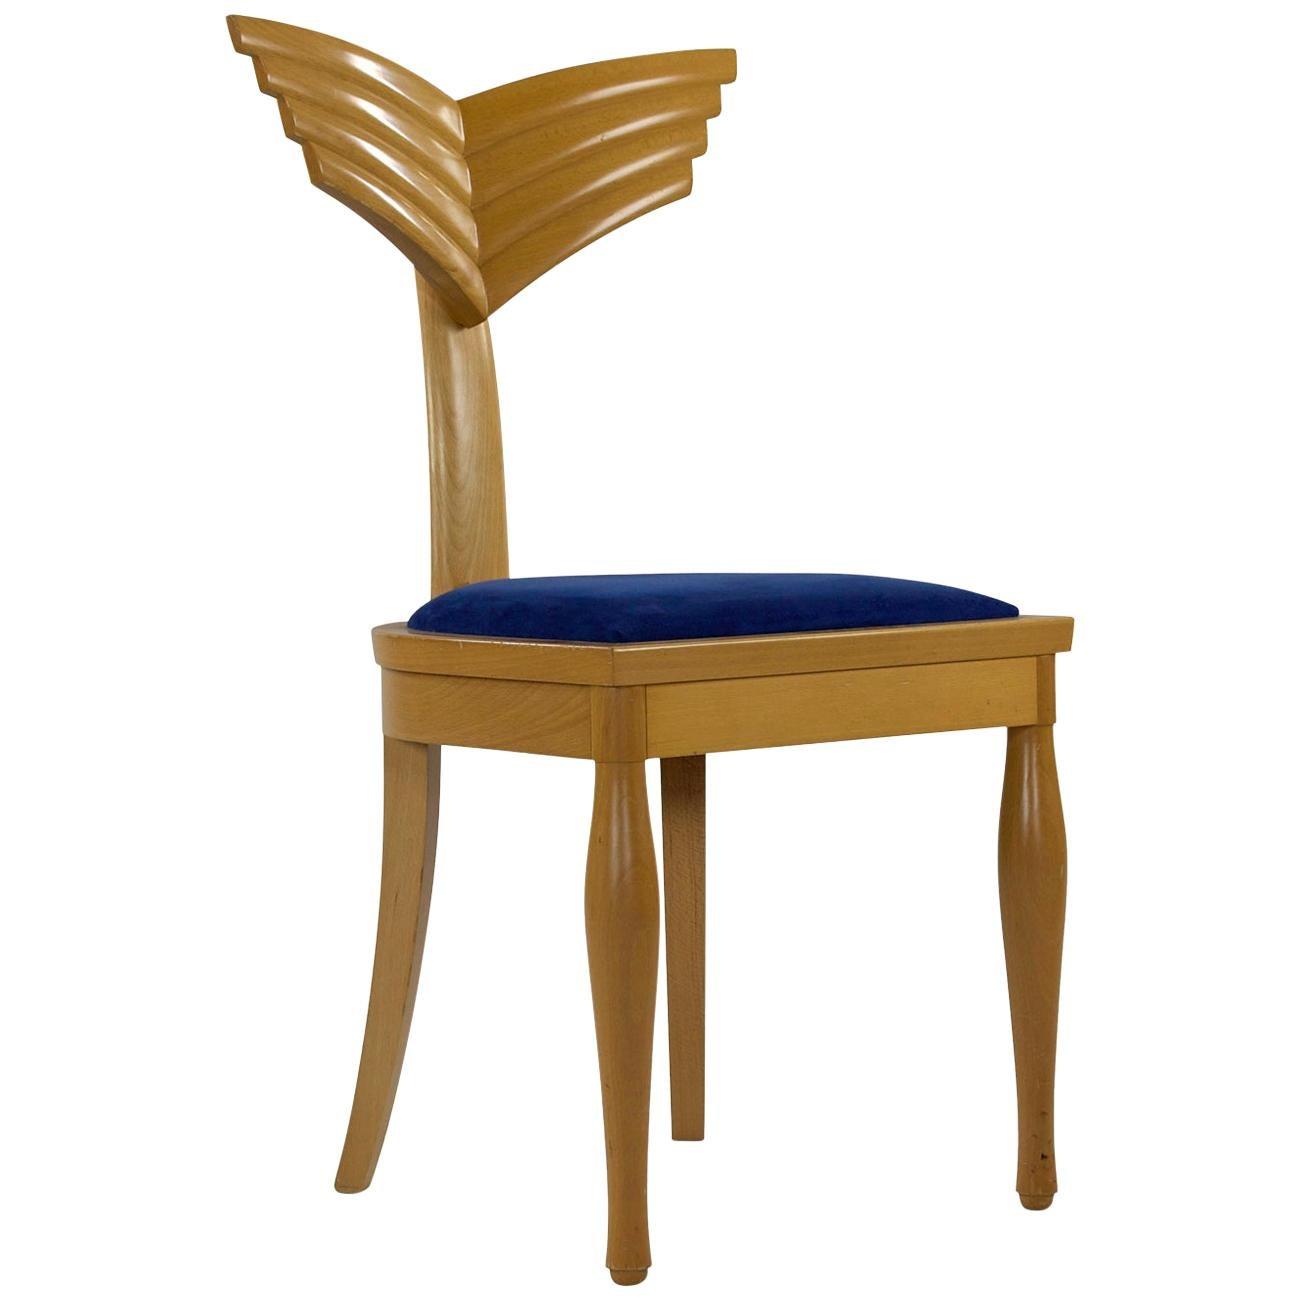 """Olimpia"" Chair, Design by Massimo Scolari, Manufactured by Giorgetti, Italy"